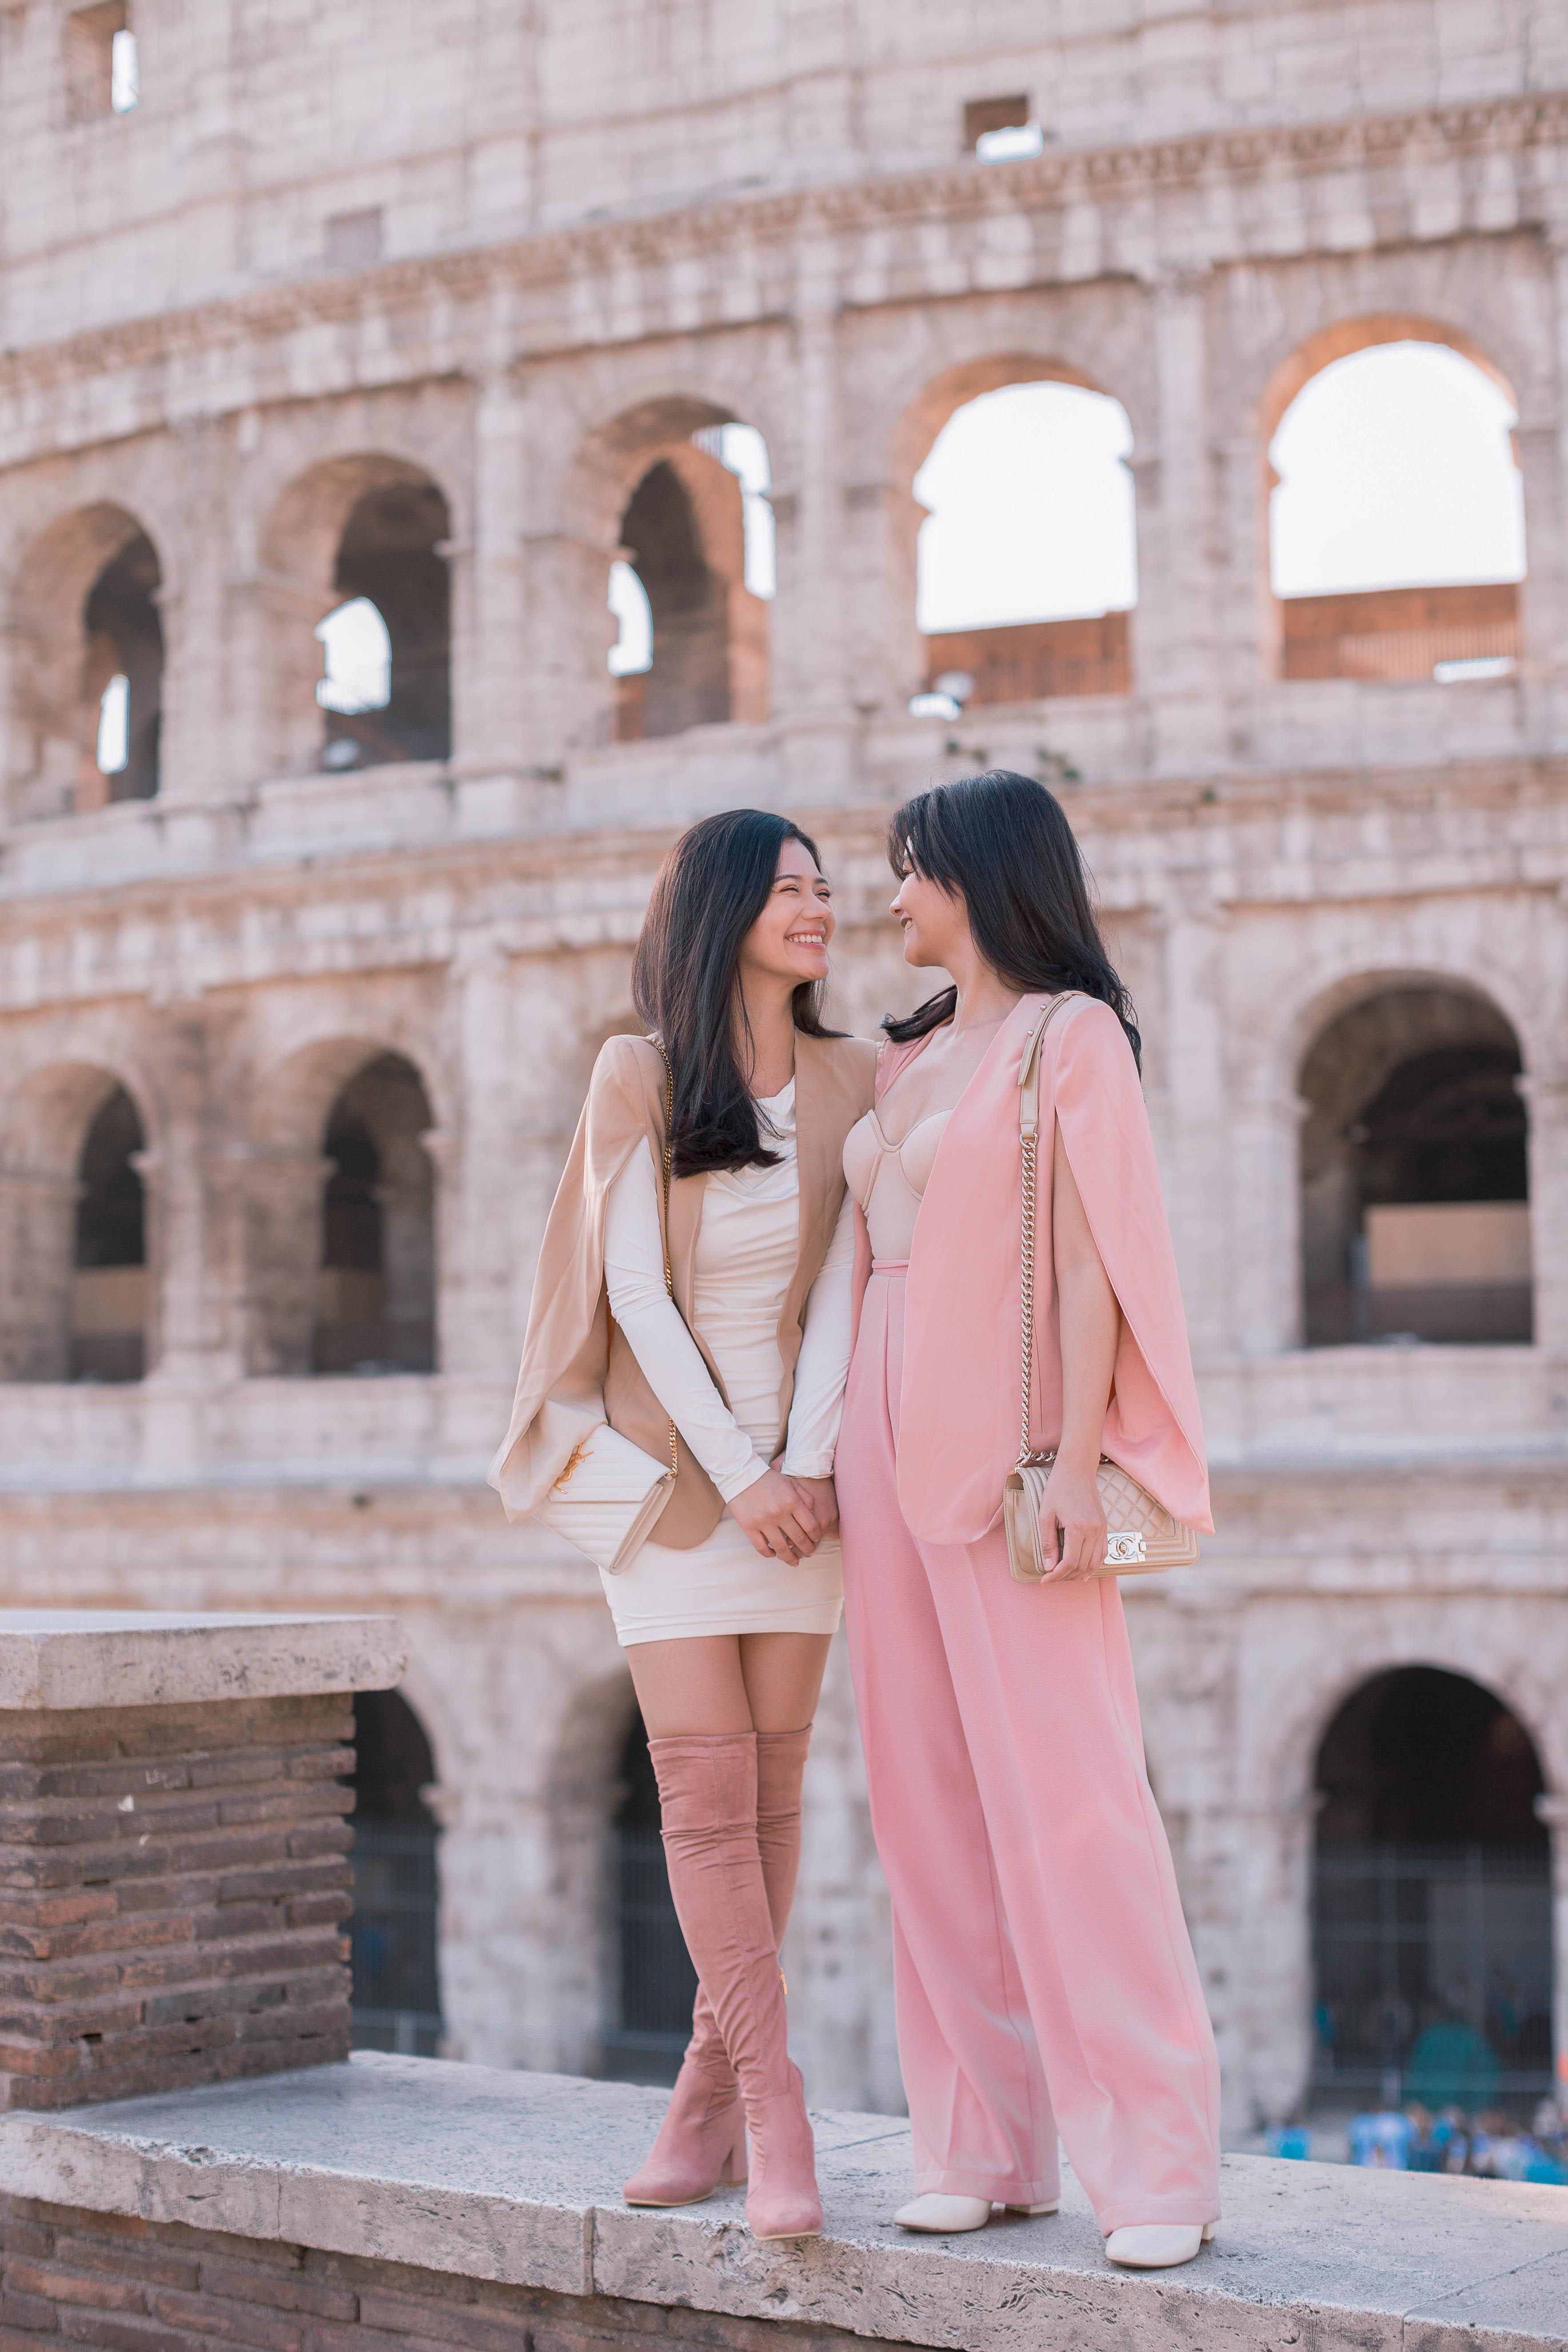 vernica_enciso-rome-s1_7 copy